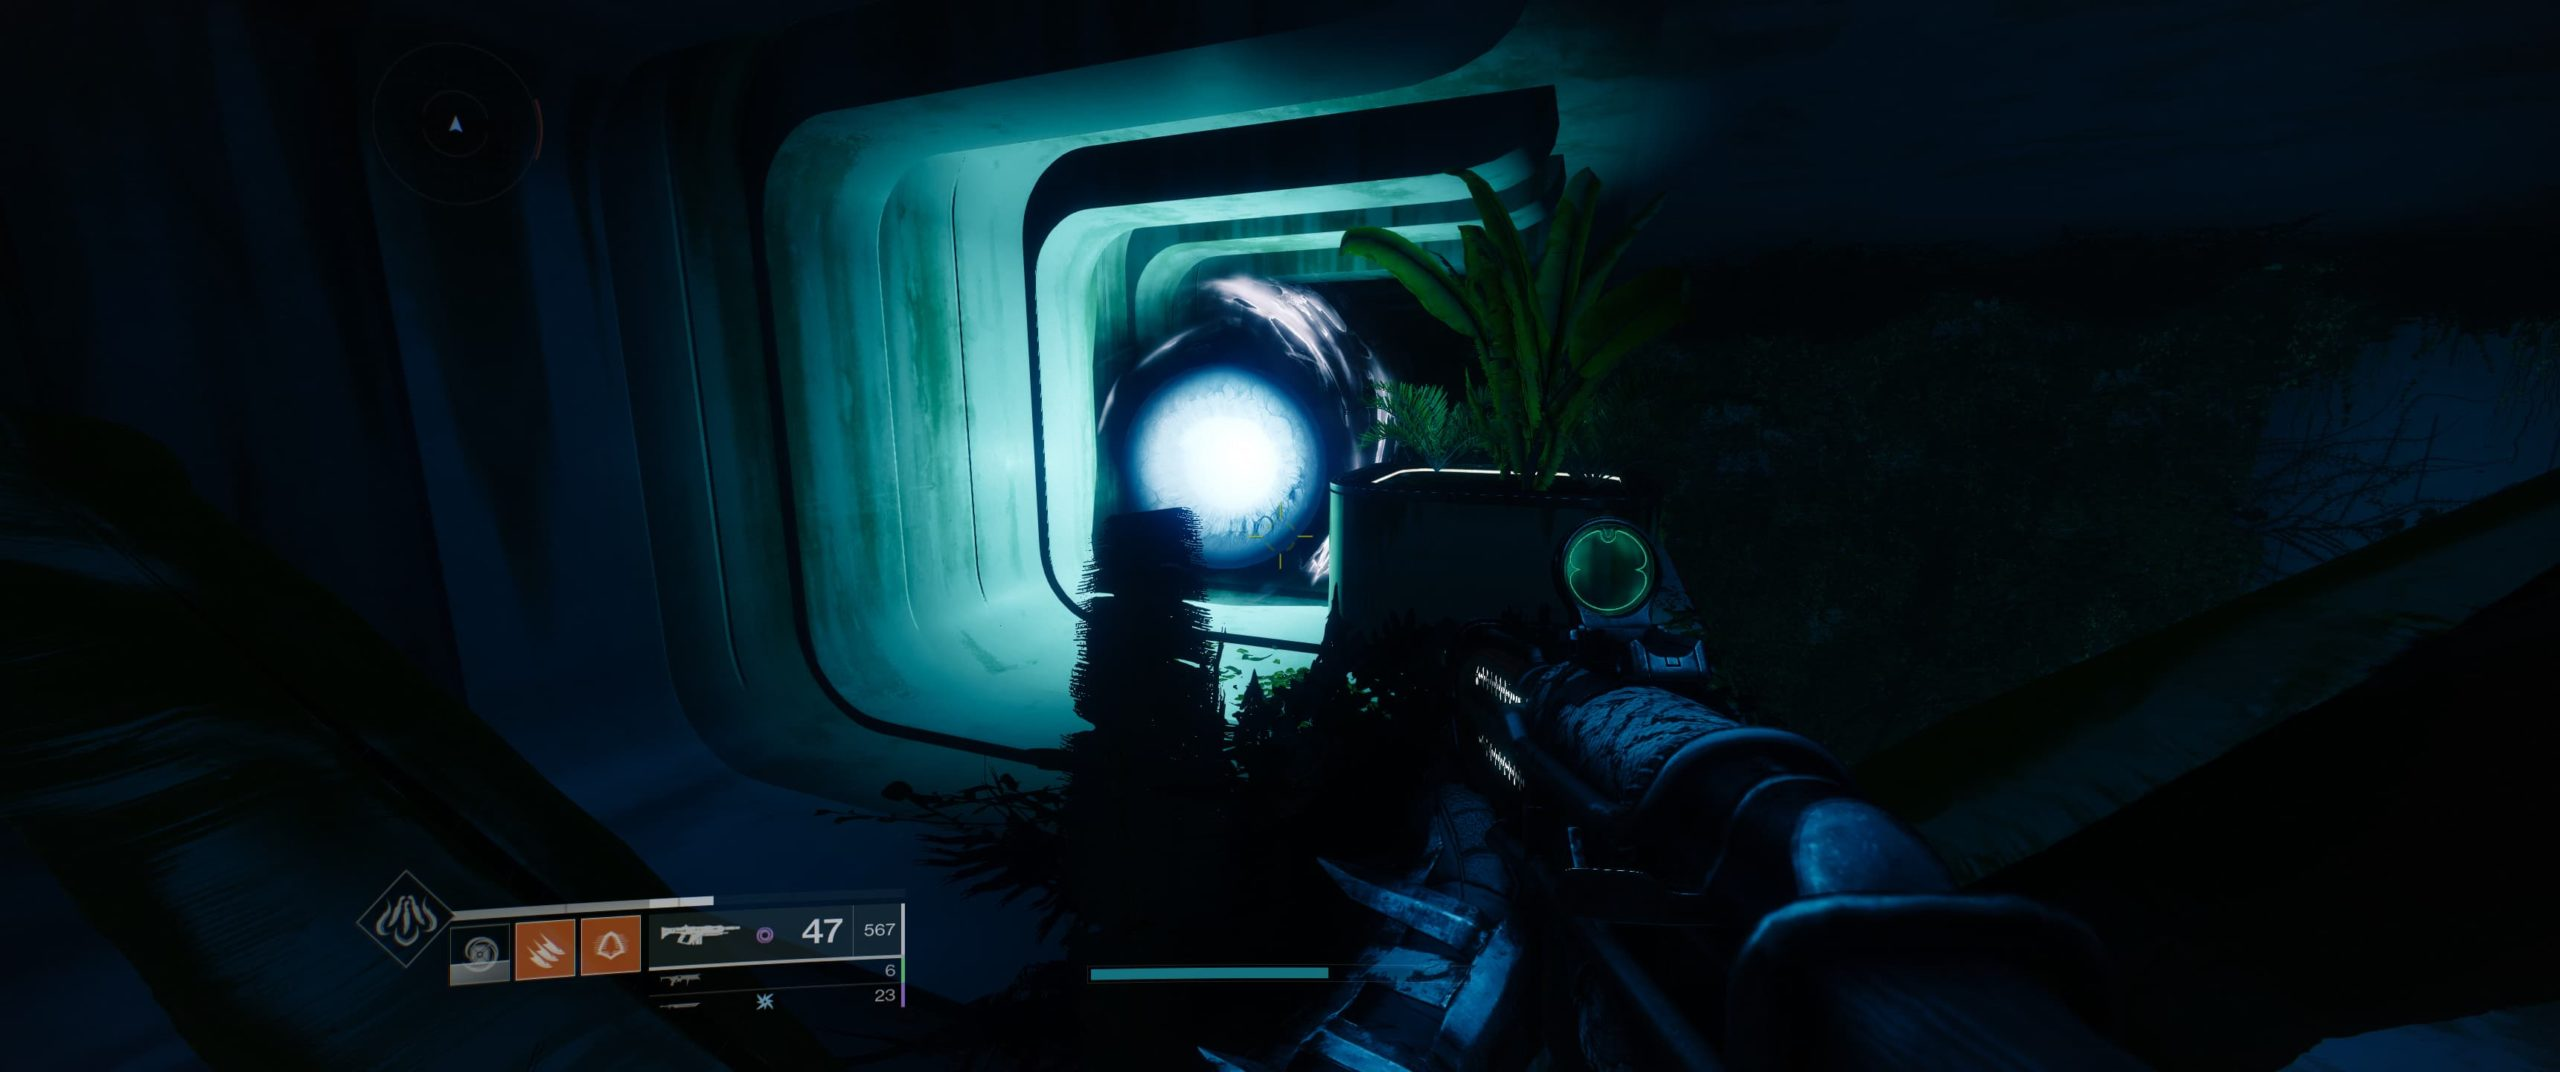 all savathun s eye locations on titan destiny 2 gamepur eye locations on titan destiny 2